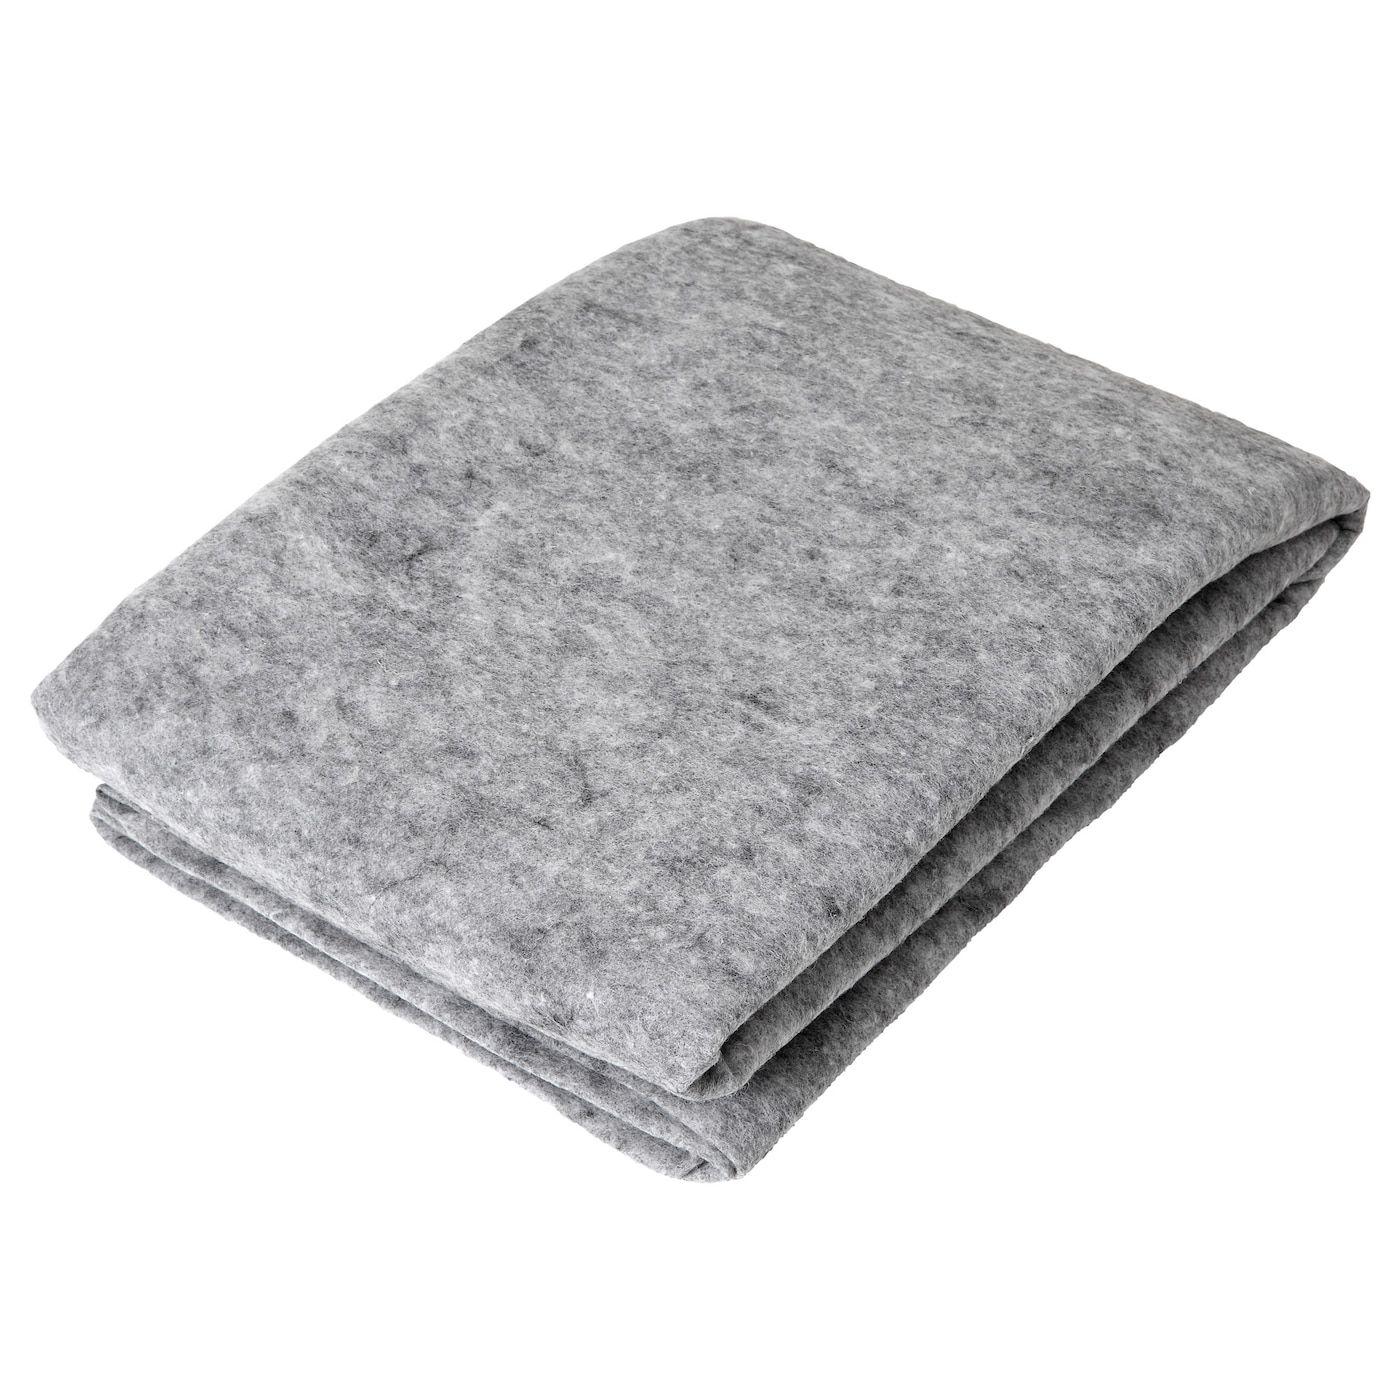 Baring Rug Underlay With Anti Slip Ikea Ikea Rug Ikea Diy Carpet